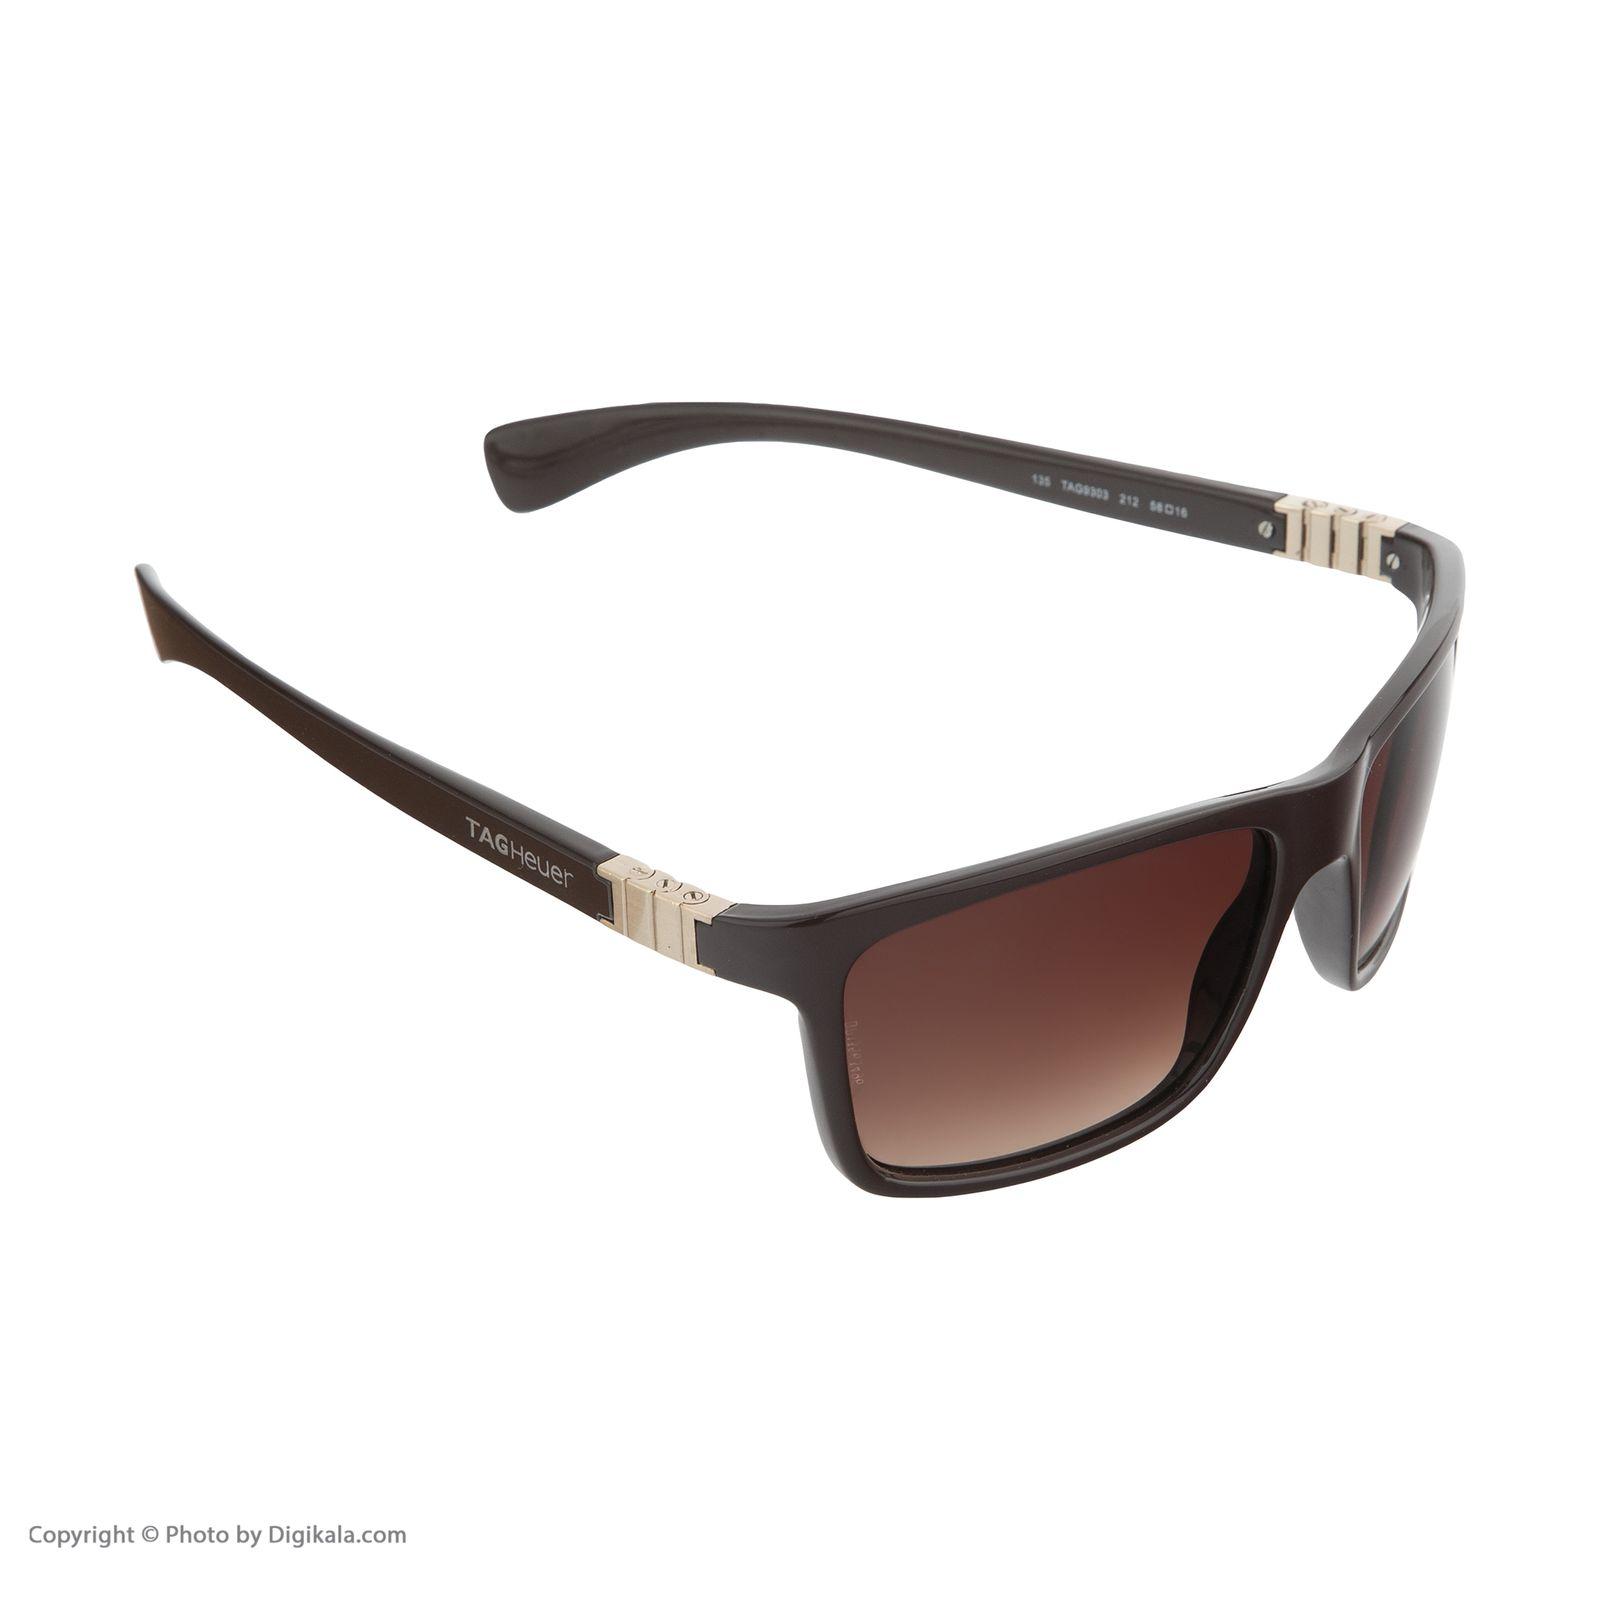 عینک آفتابی تگ هویر مدل 9303 -  - 4